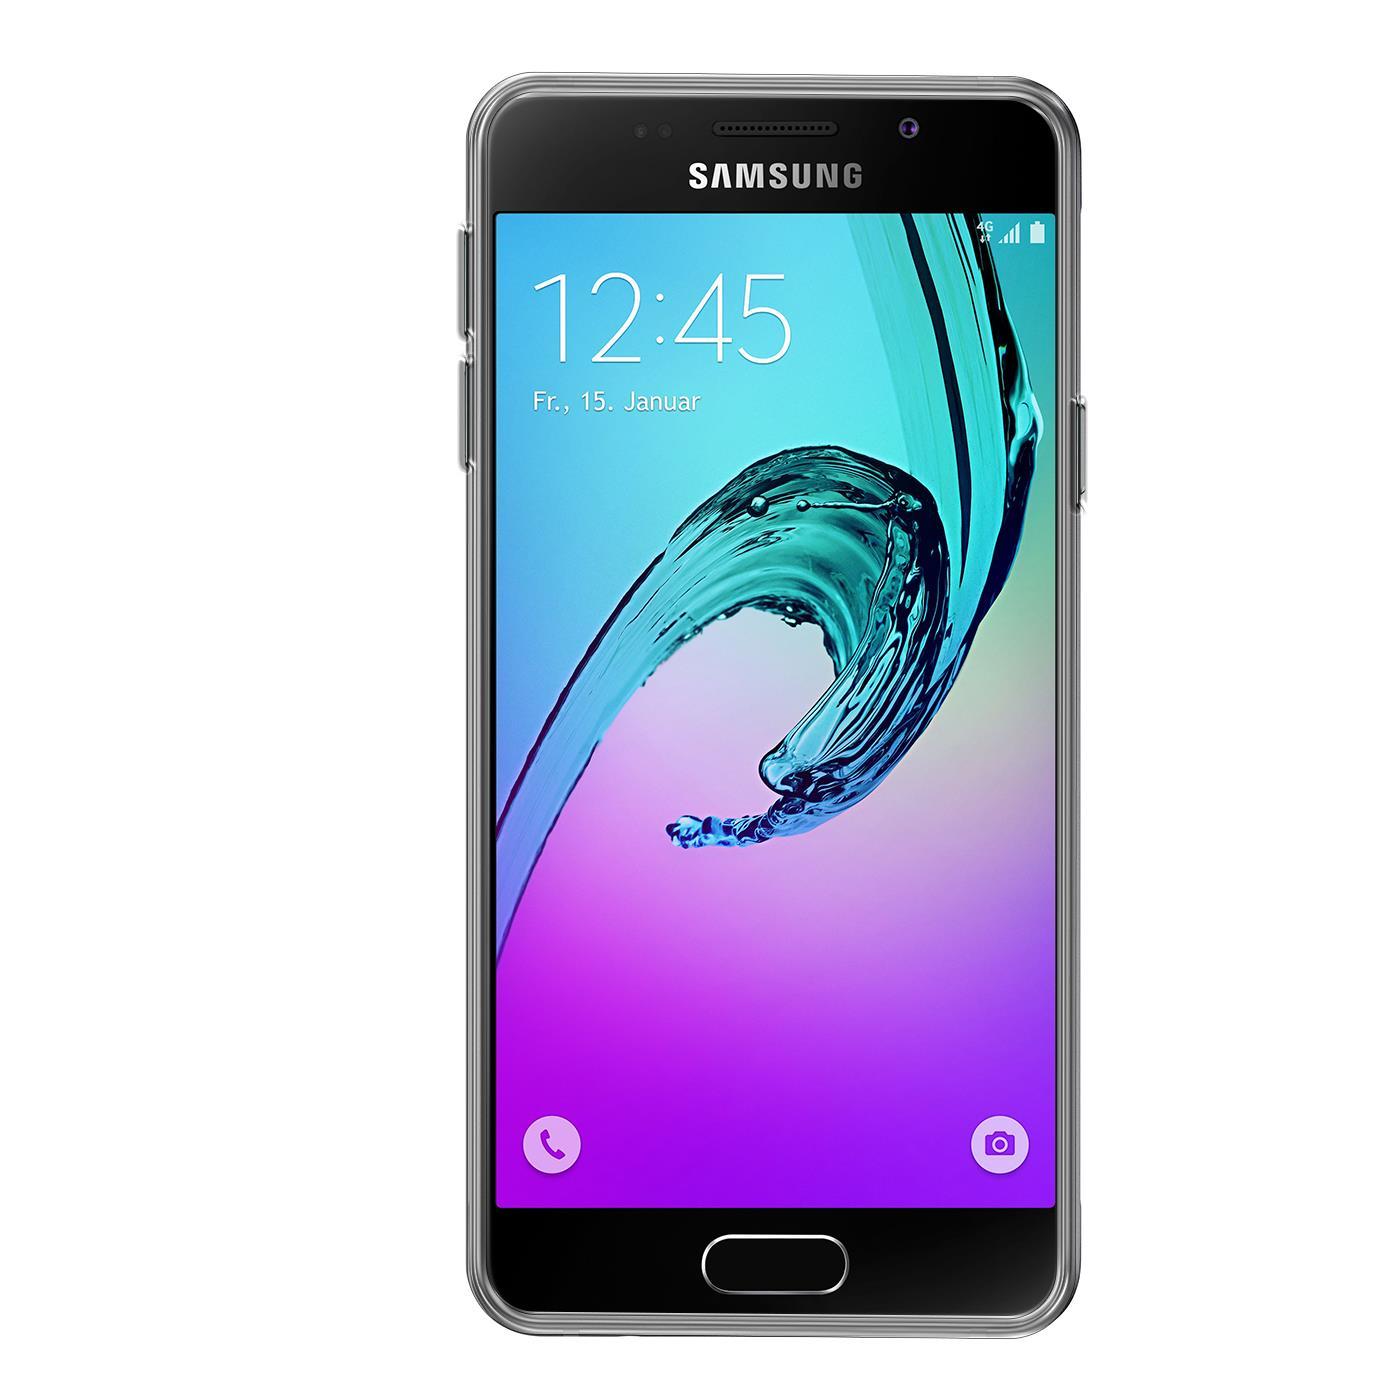 Samsung-Galaxy-a3-2016-Thin-Silikon-Klar-Case-Cover-Ultra-Slim-Stossfeste-Gel Indexbild 4